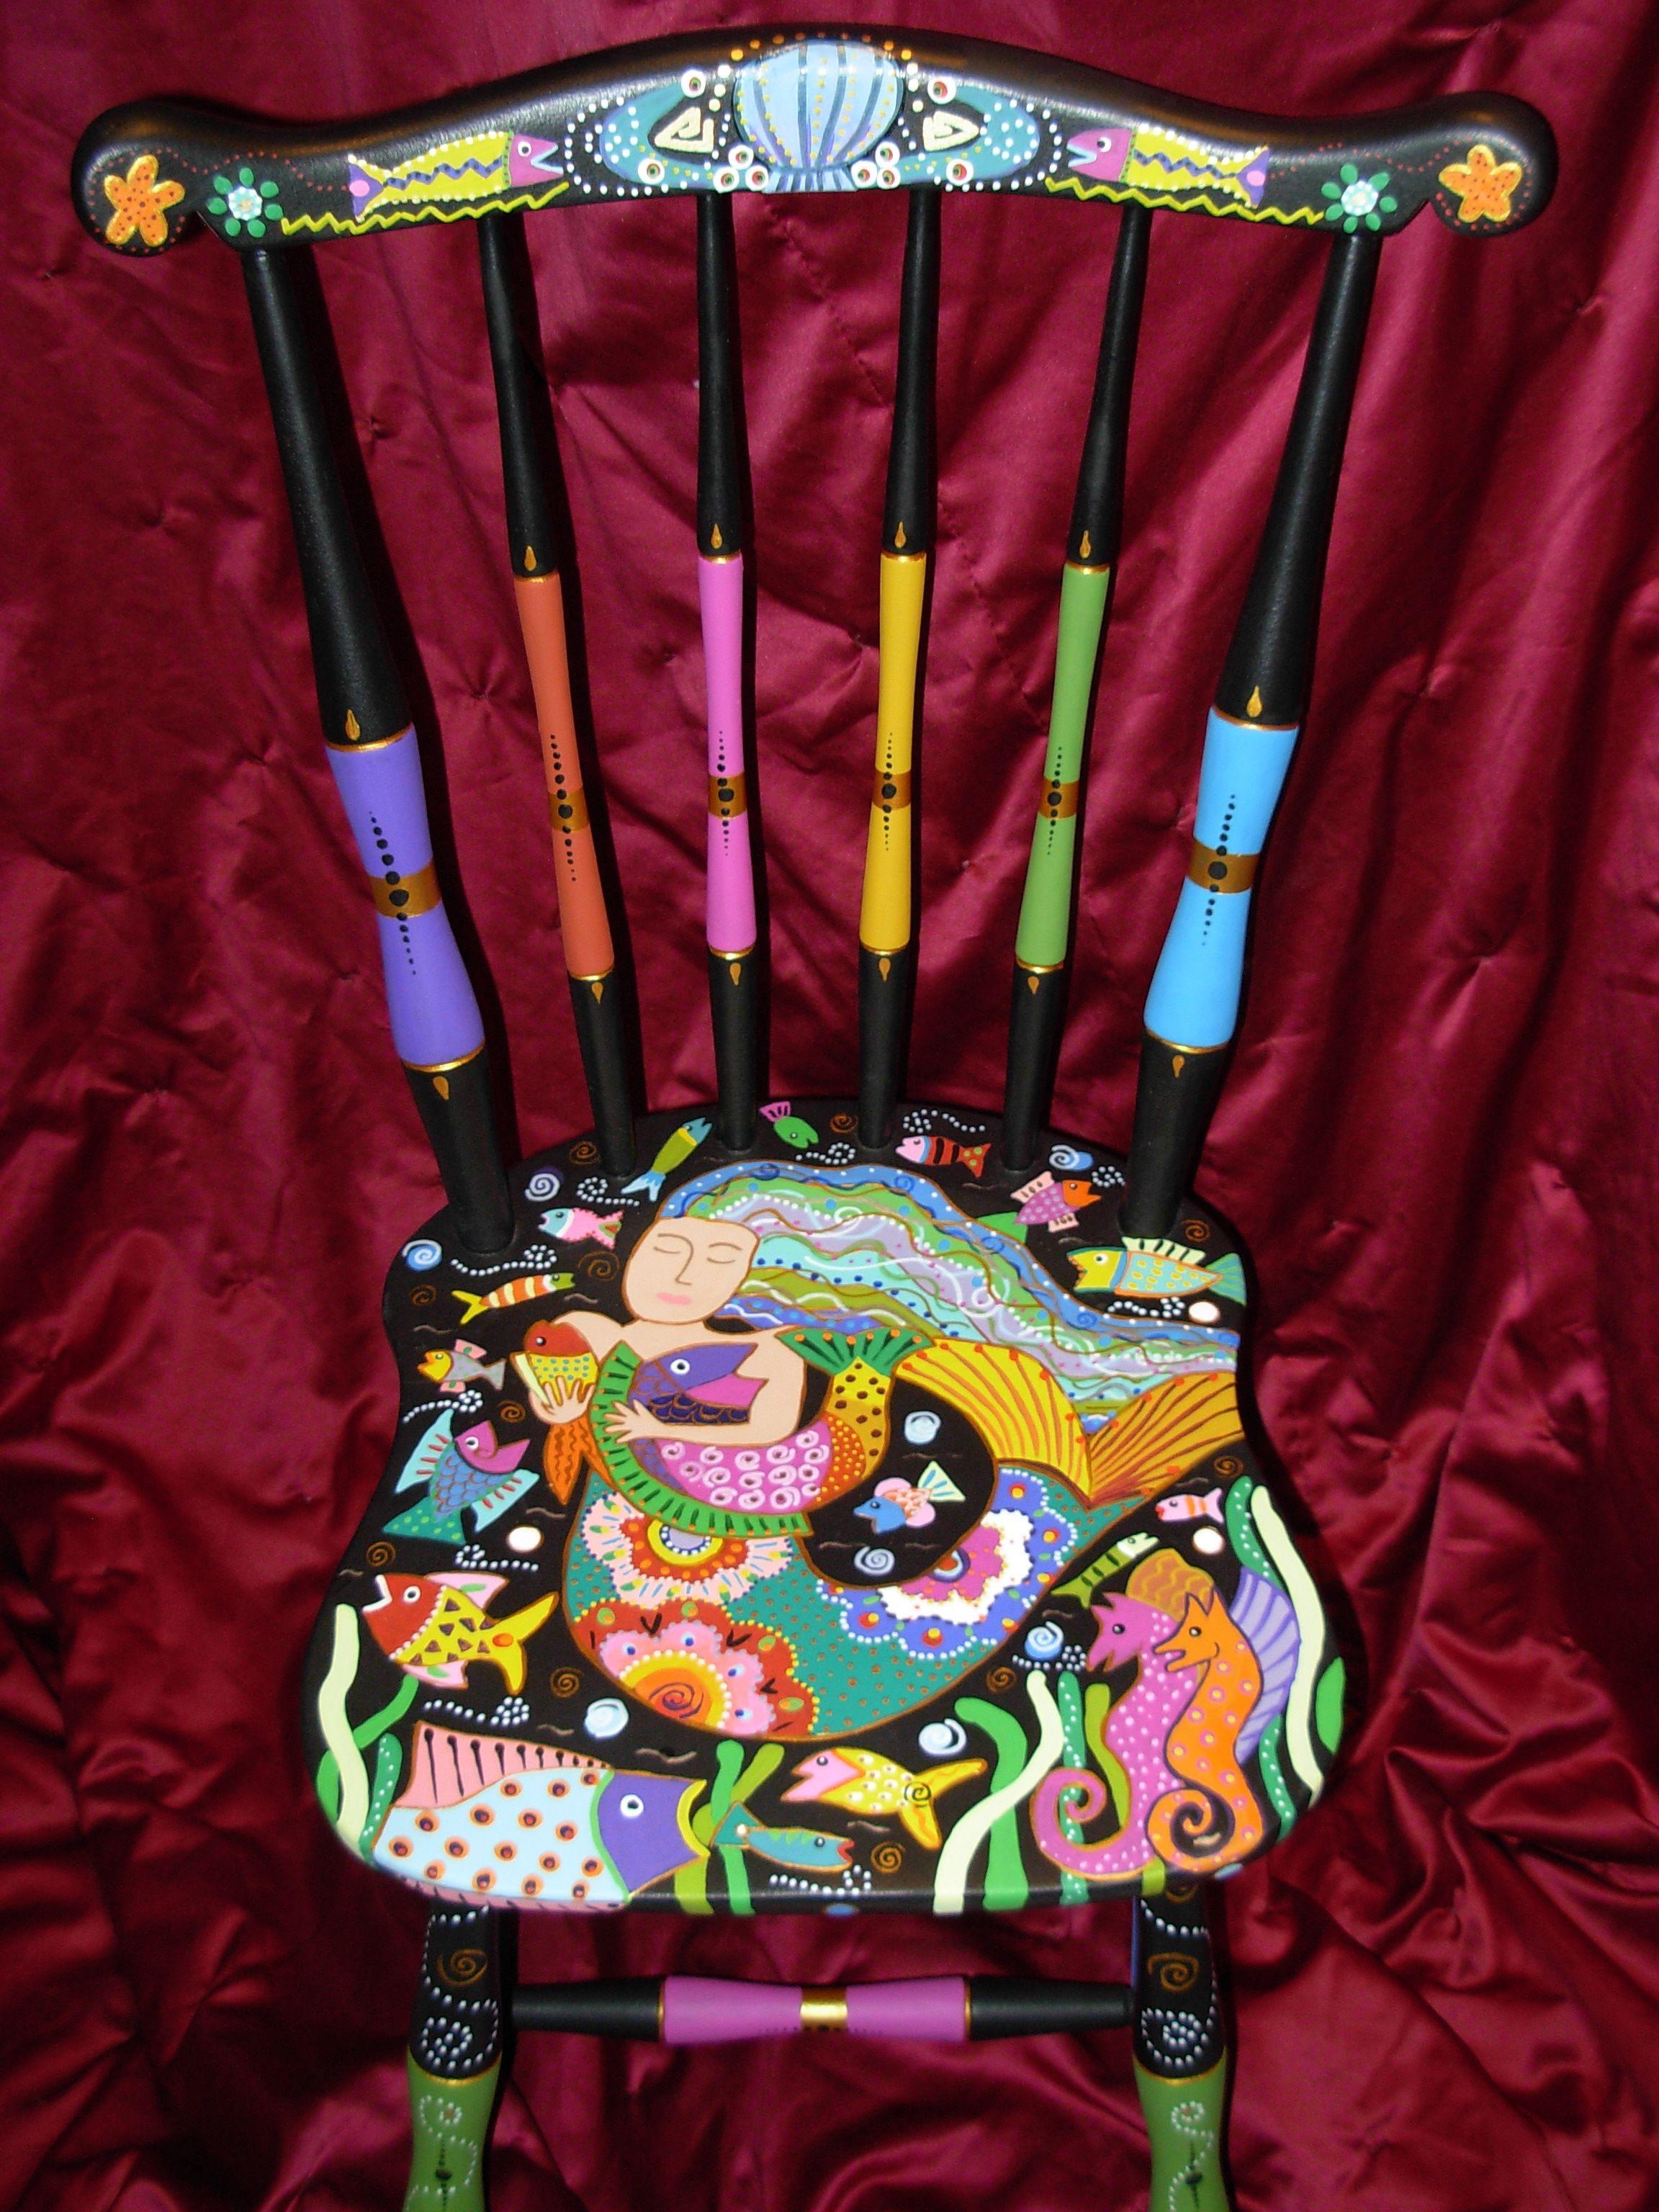 Painted chairs pinterest - Painted Mermaid Chair By Marie Lloyd